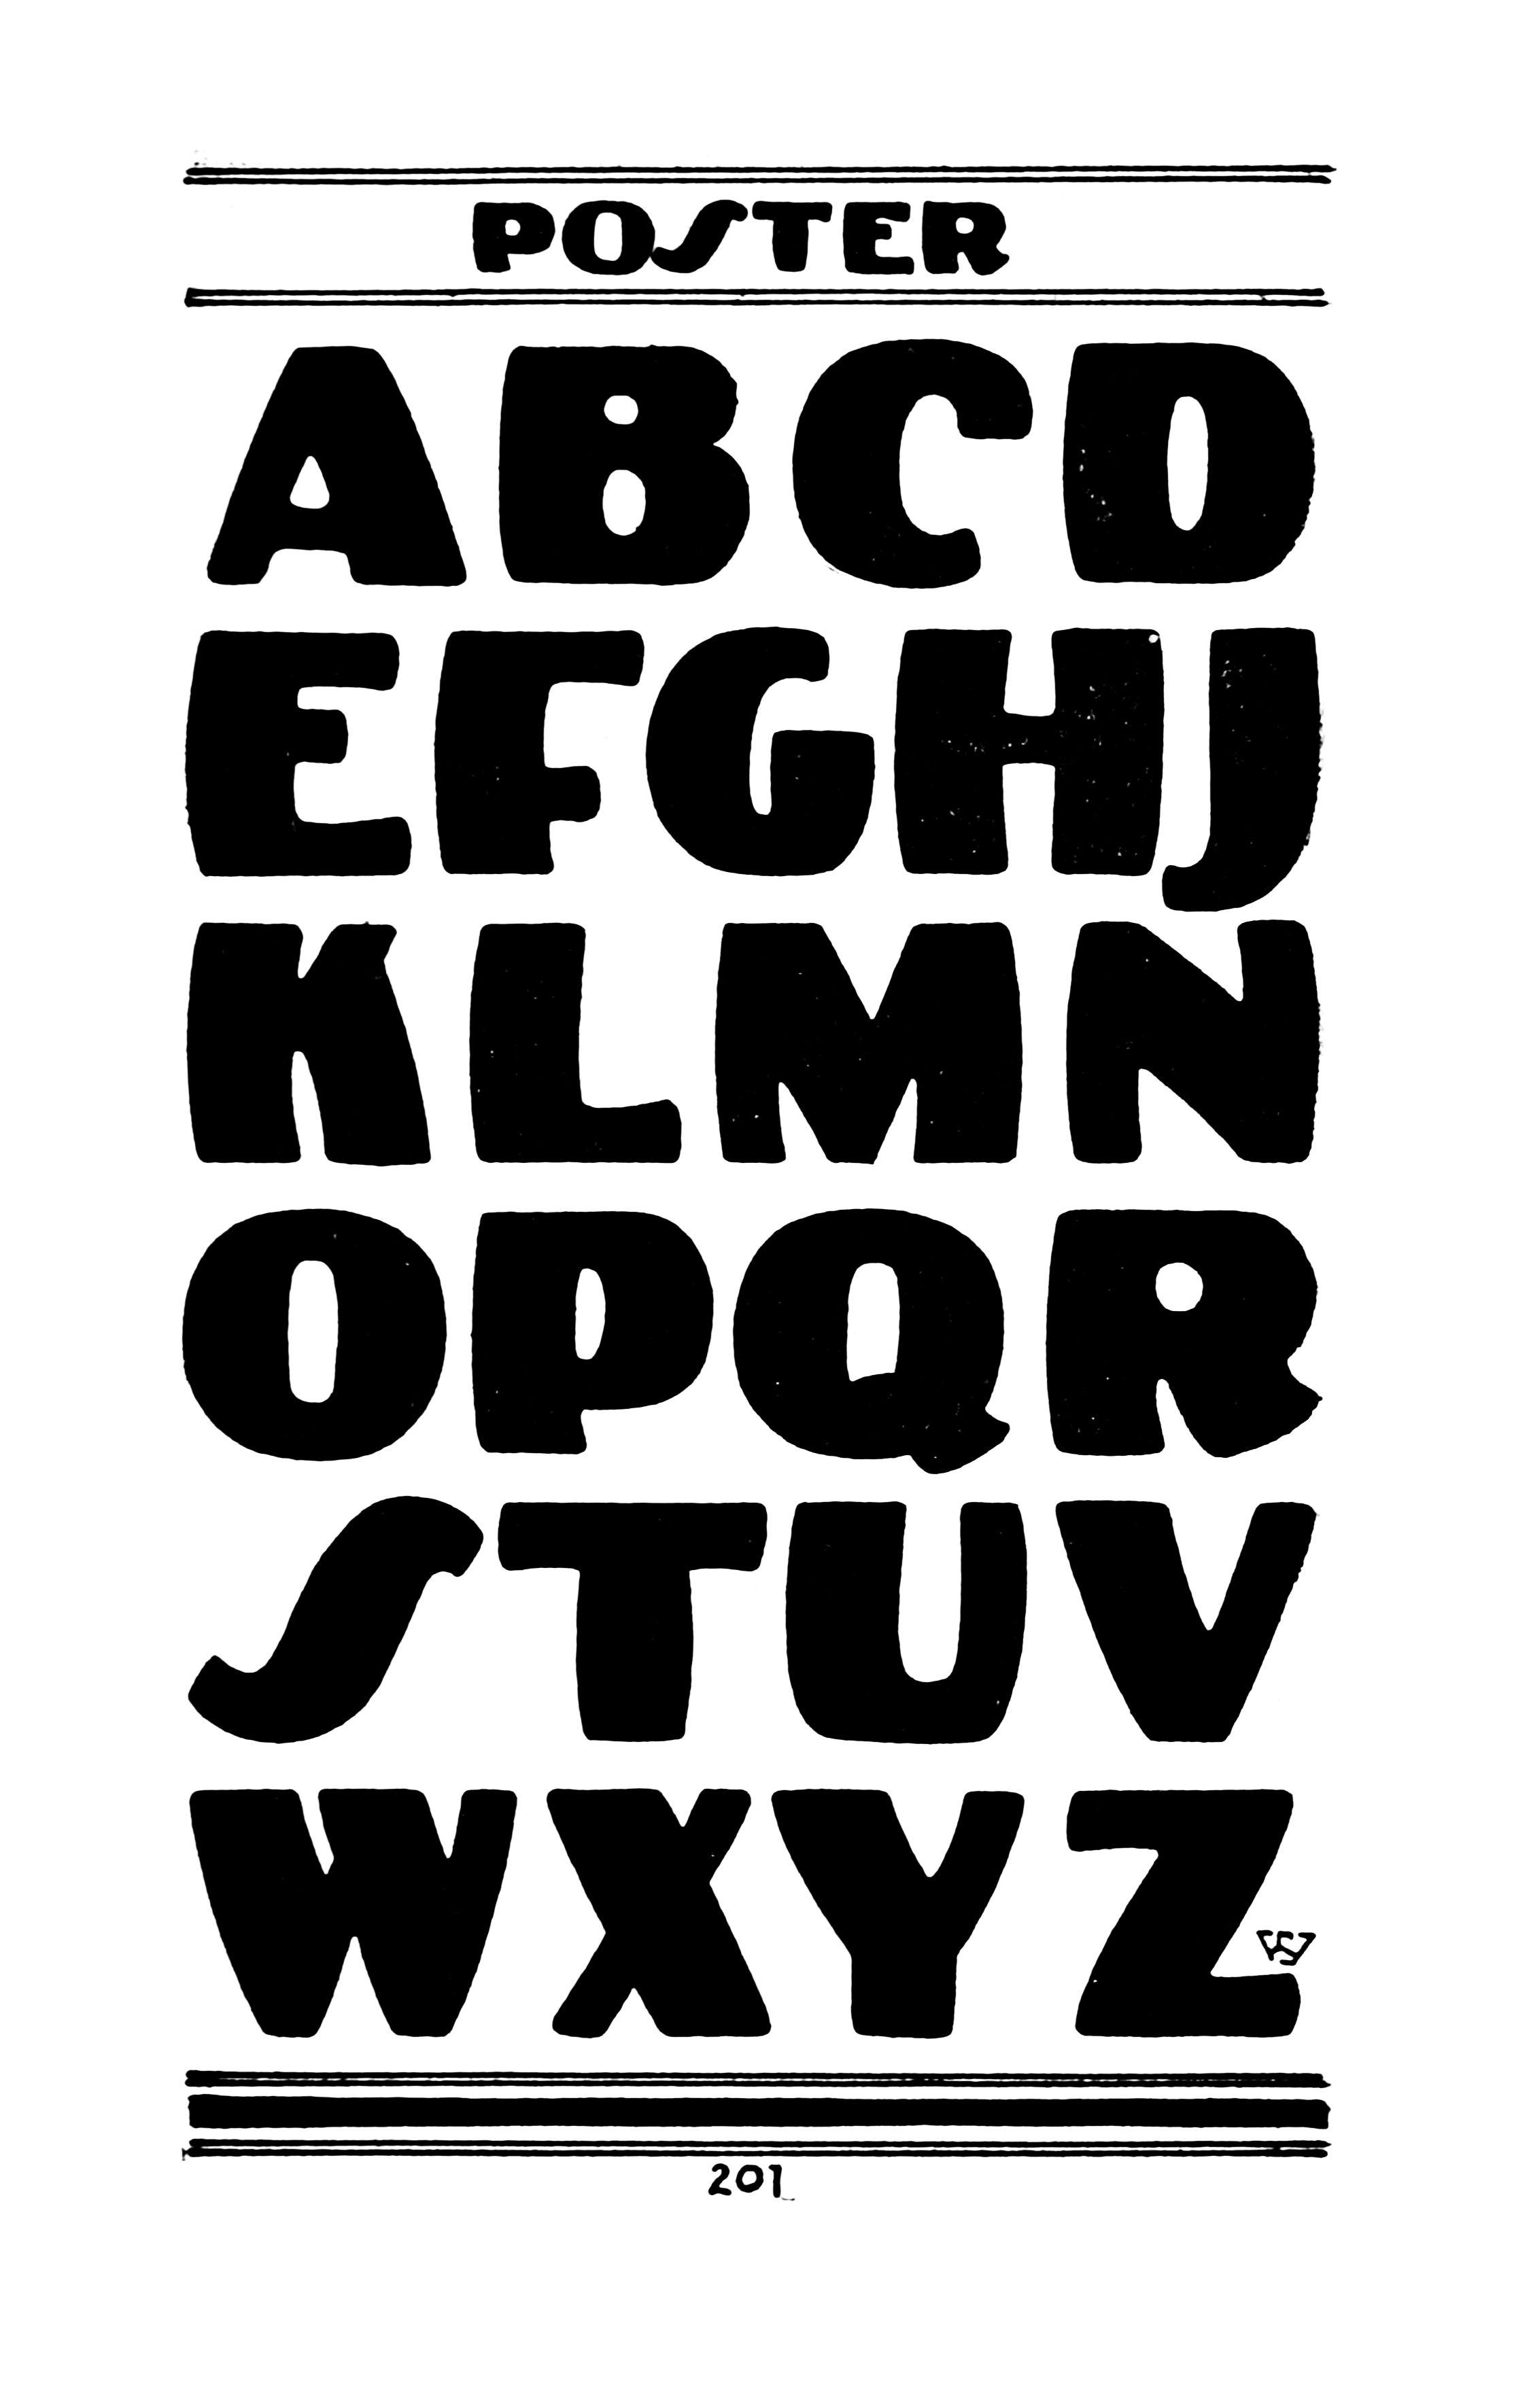 Fun Retro Typeface With A Unique S